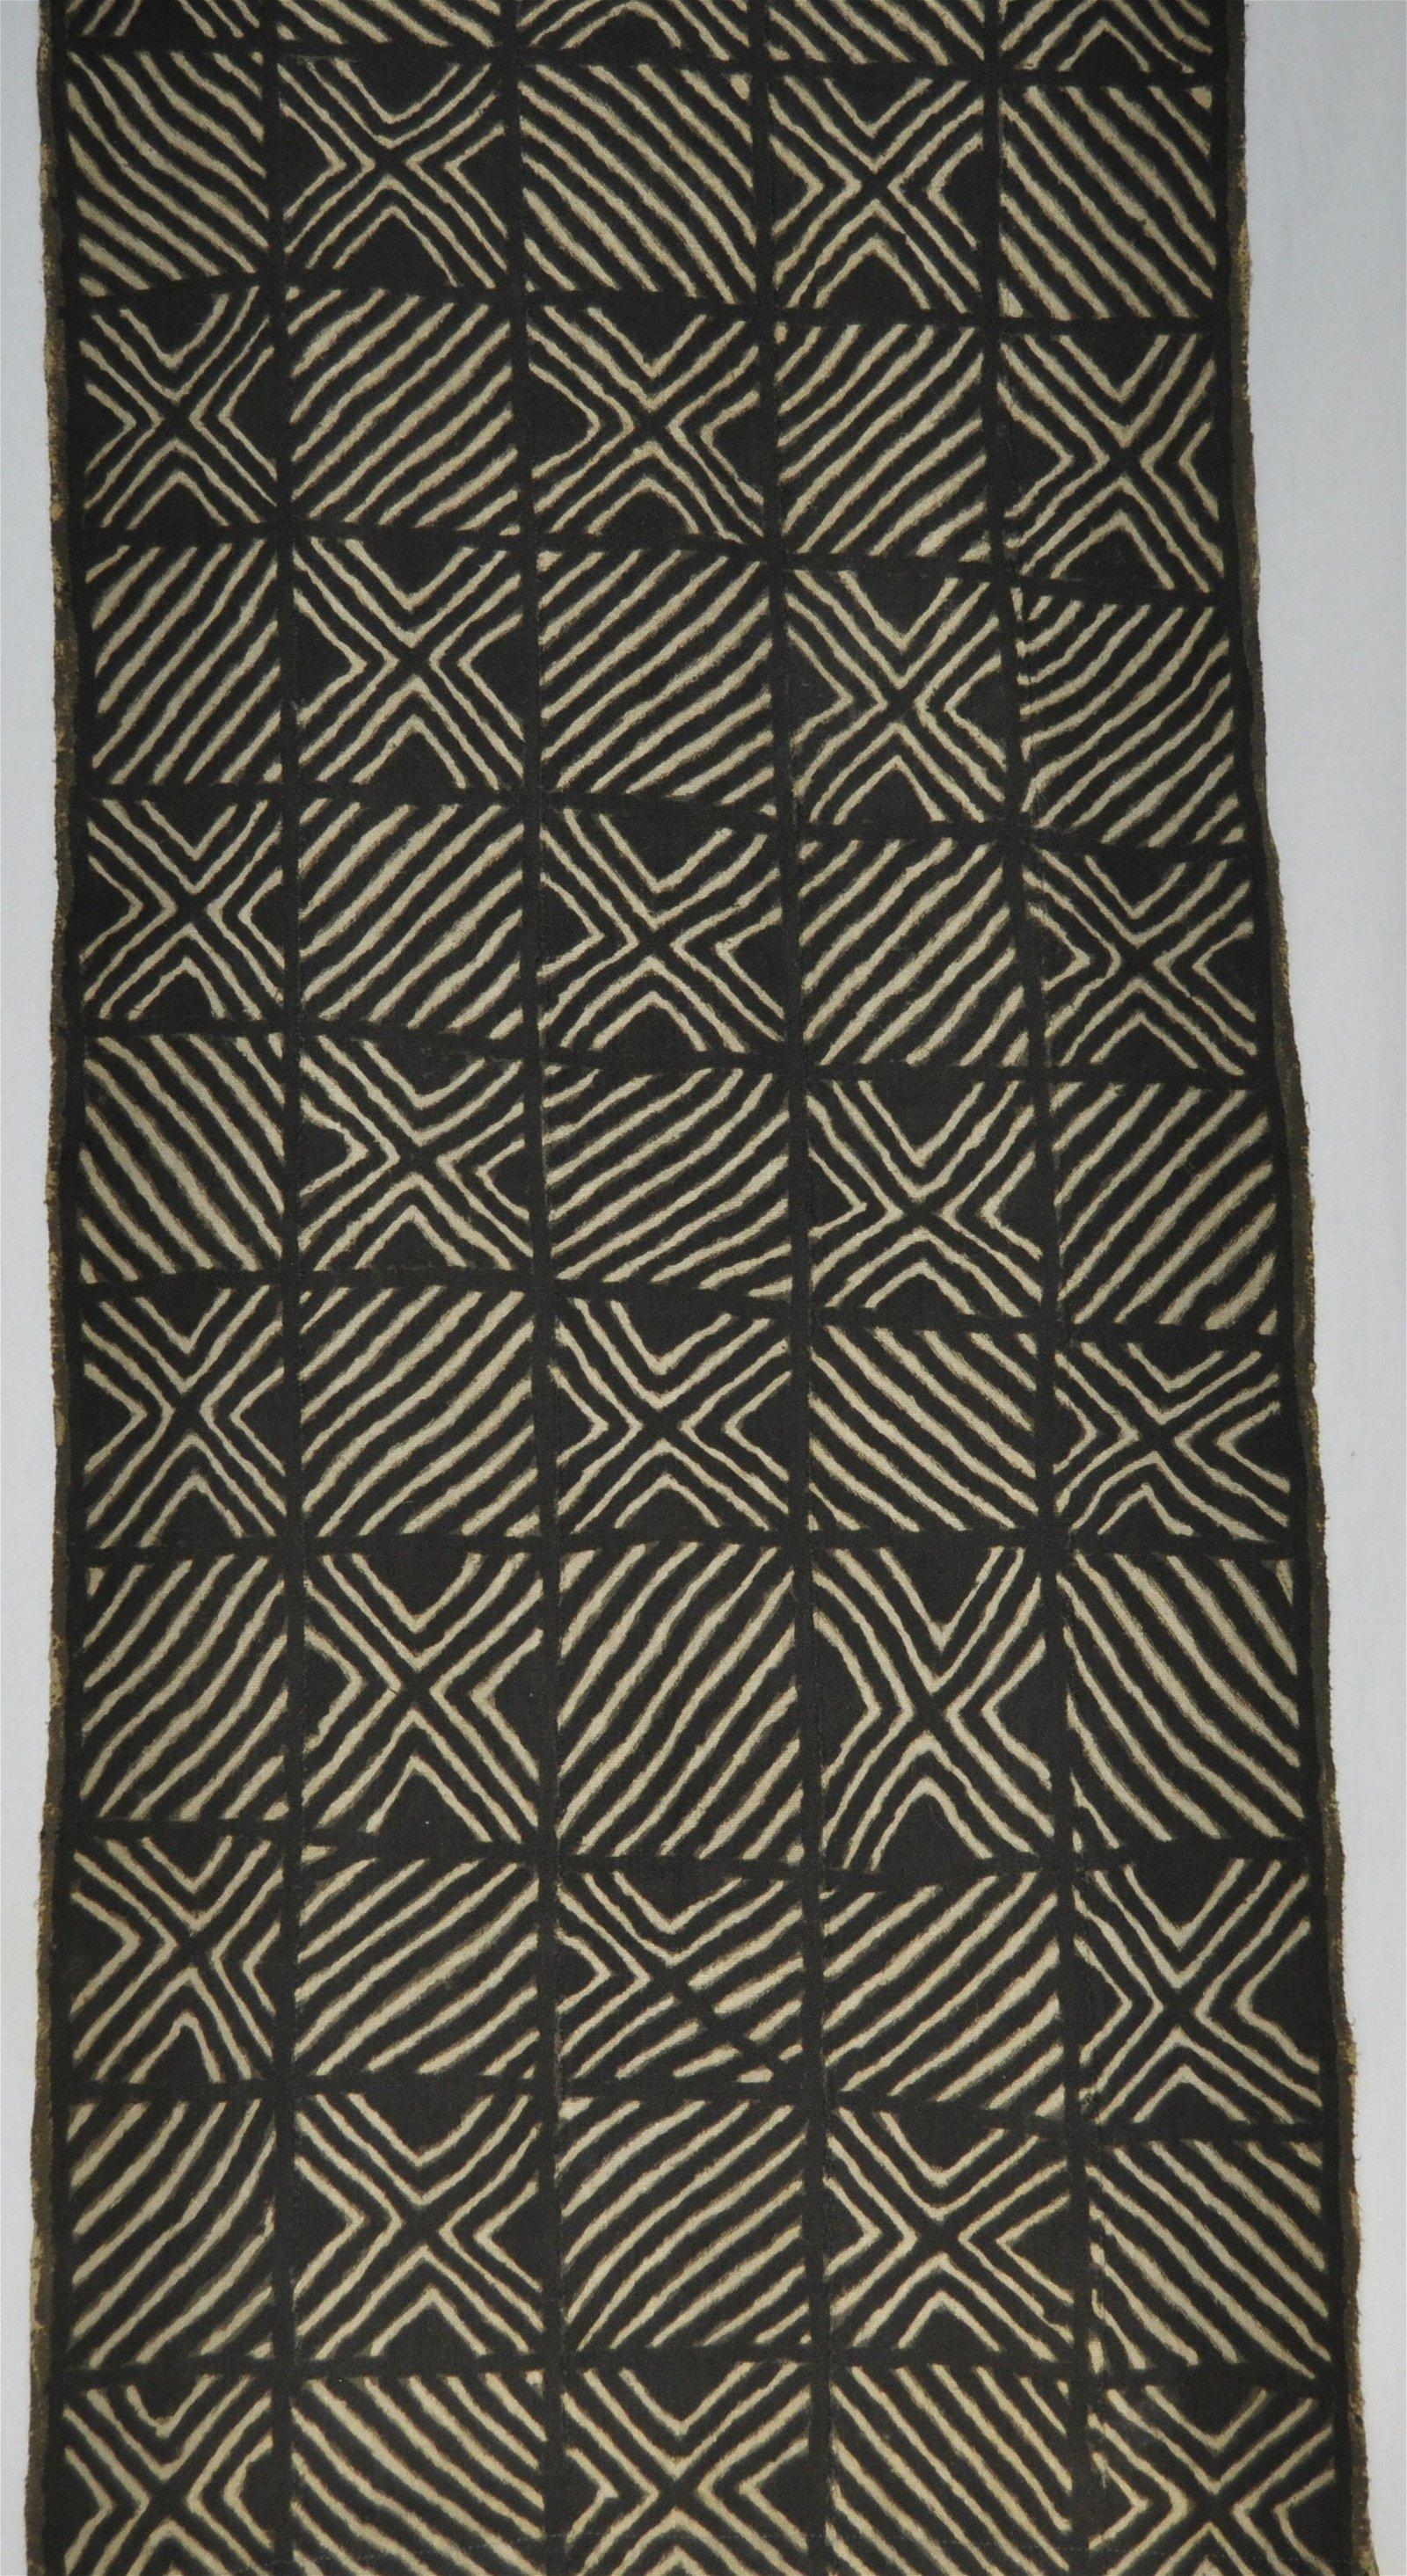 Malian Bogolan Textile